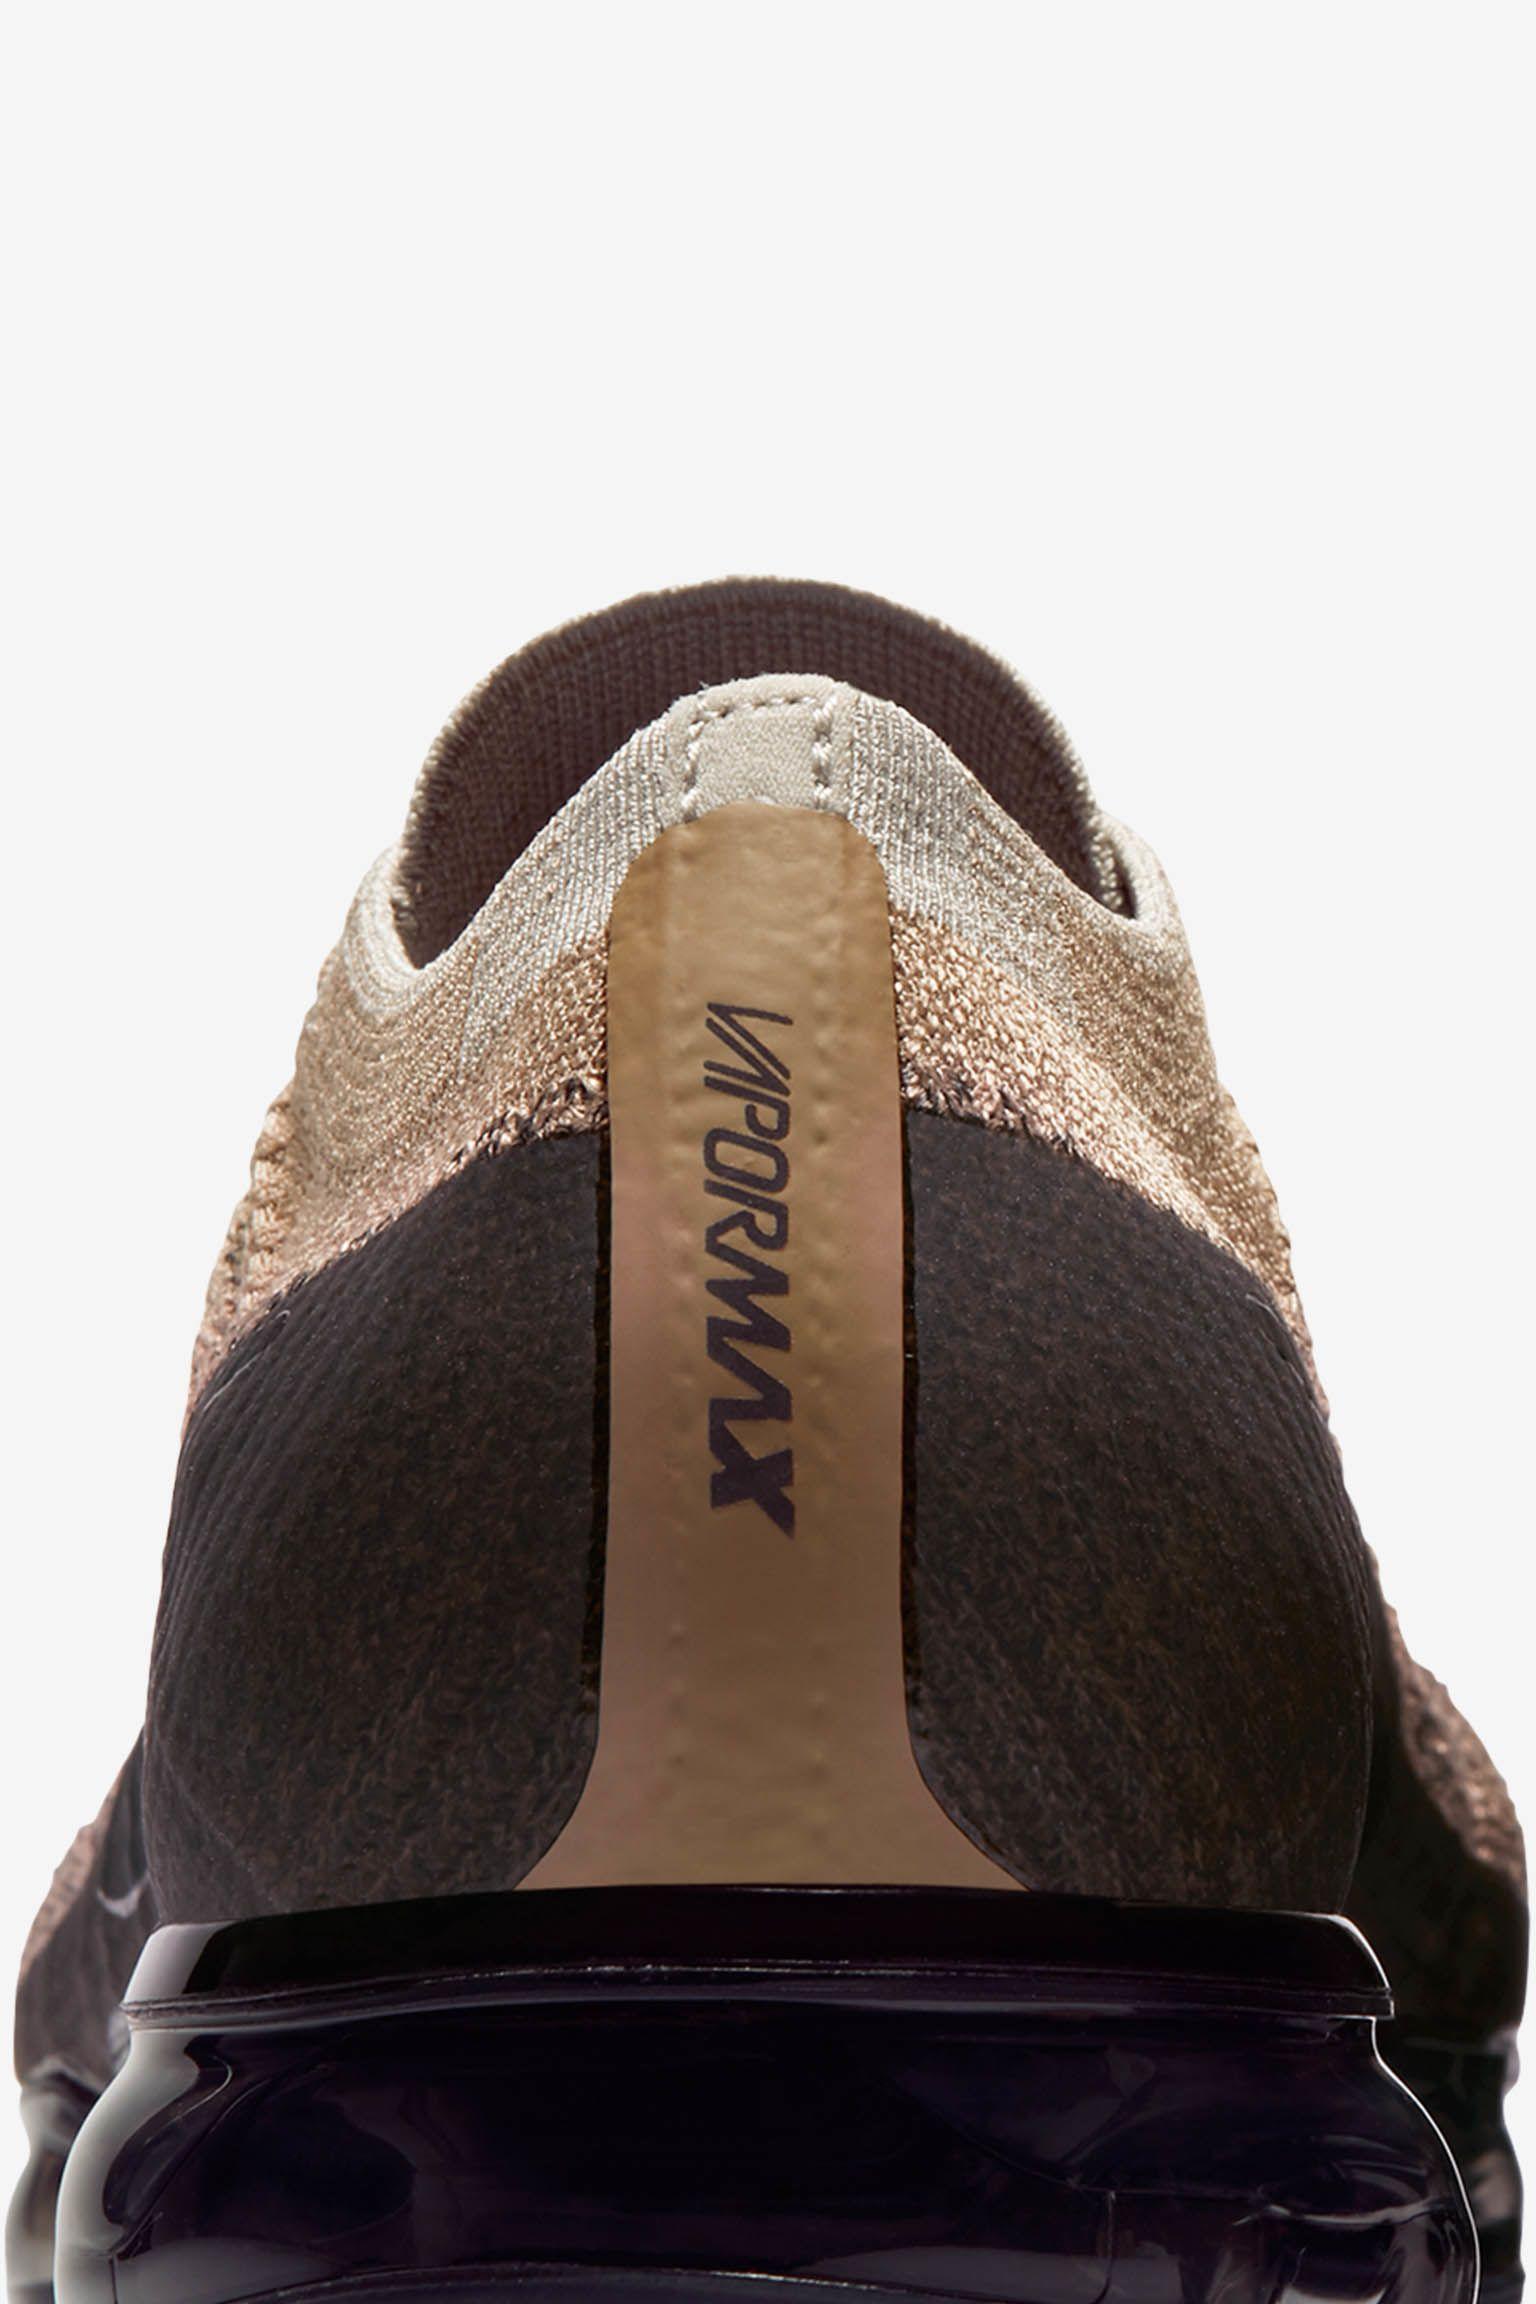 Nike Air Vapormax Date 'khaki amp; Nike Anthracite' Release 71wqd0C